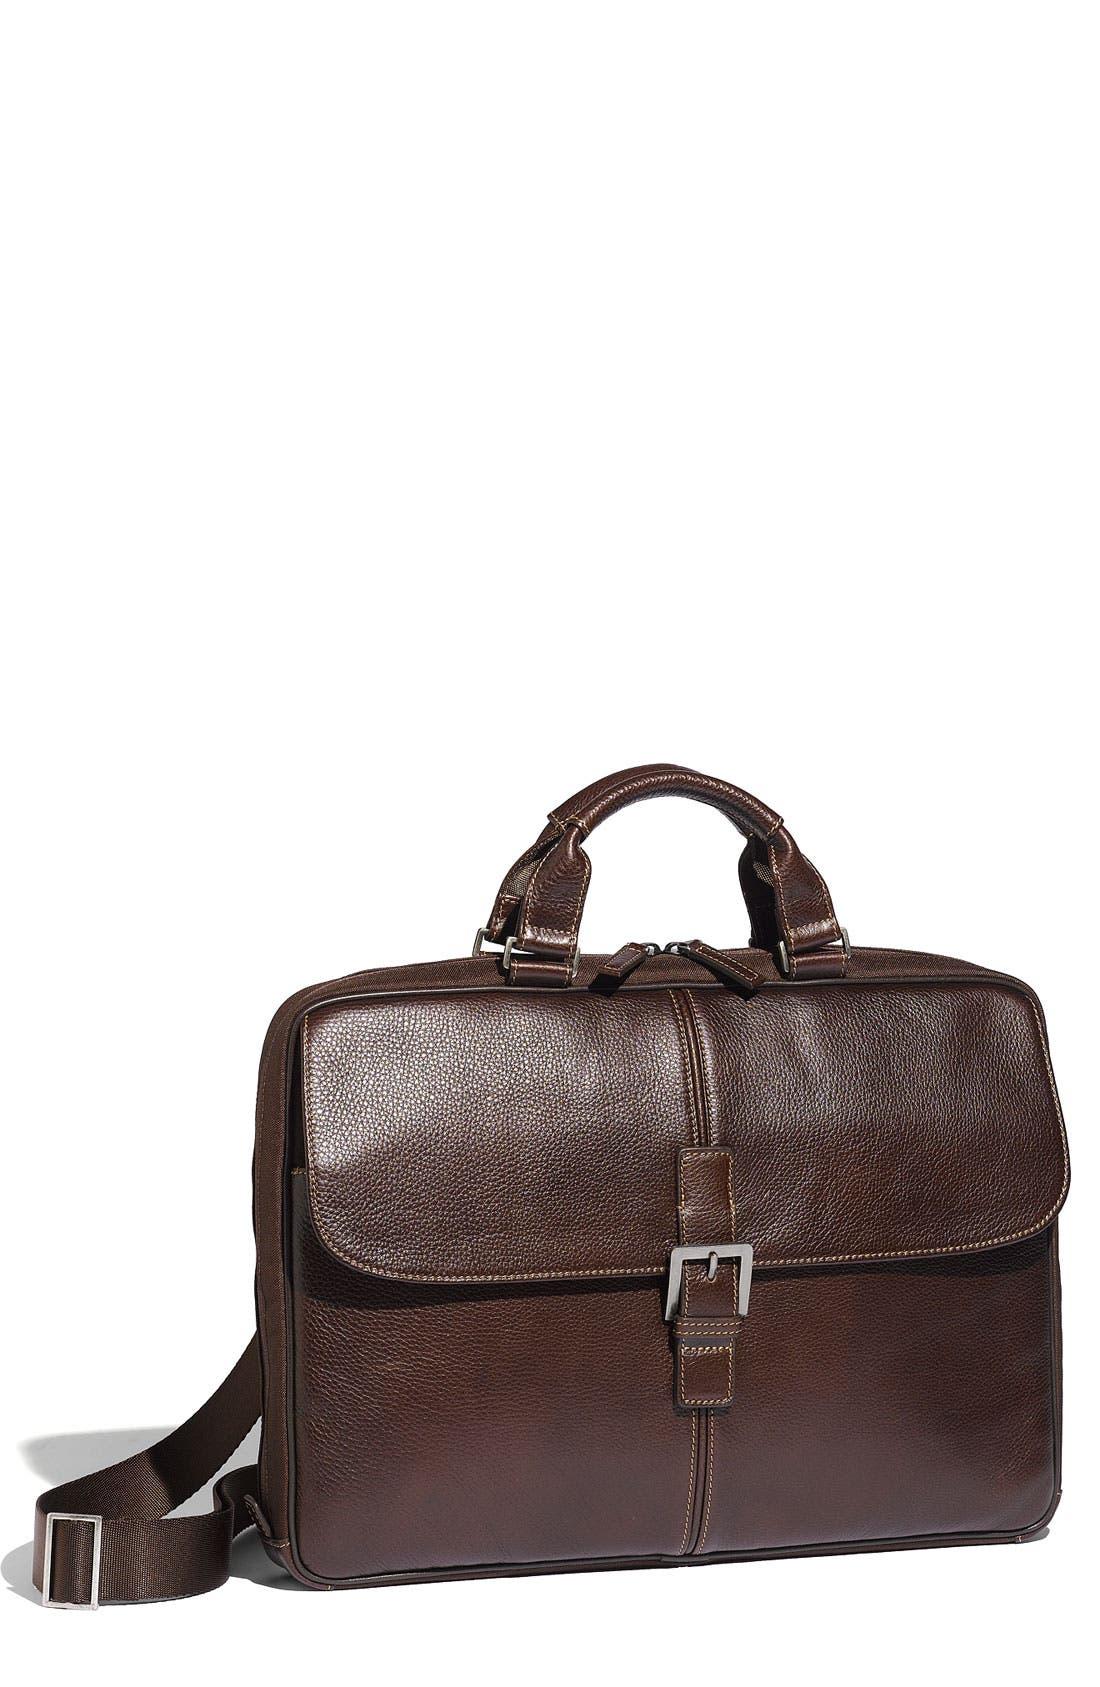 Main Image - Boconi 'Tyler' Tumbled Leather Portfolio Briefcase